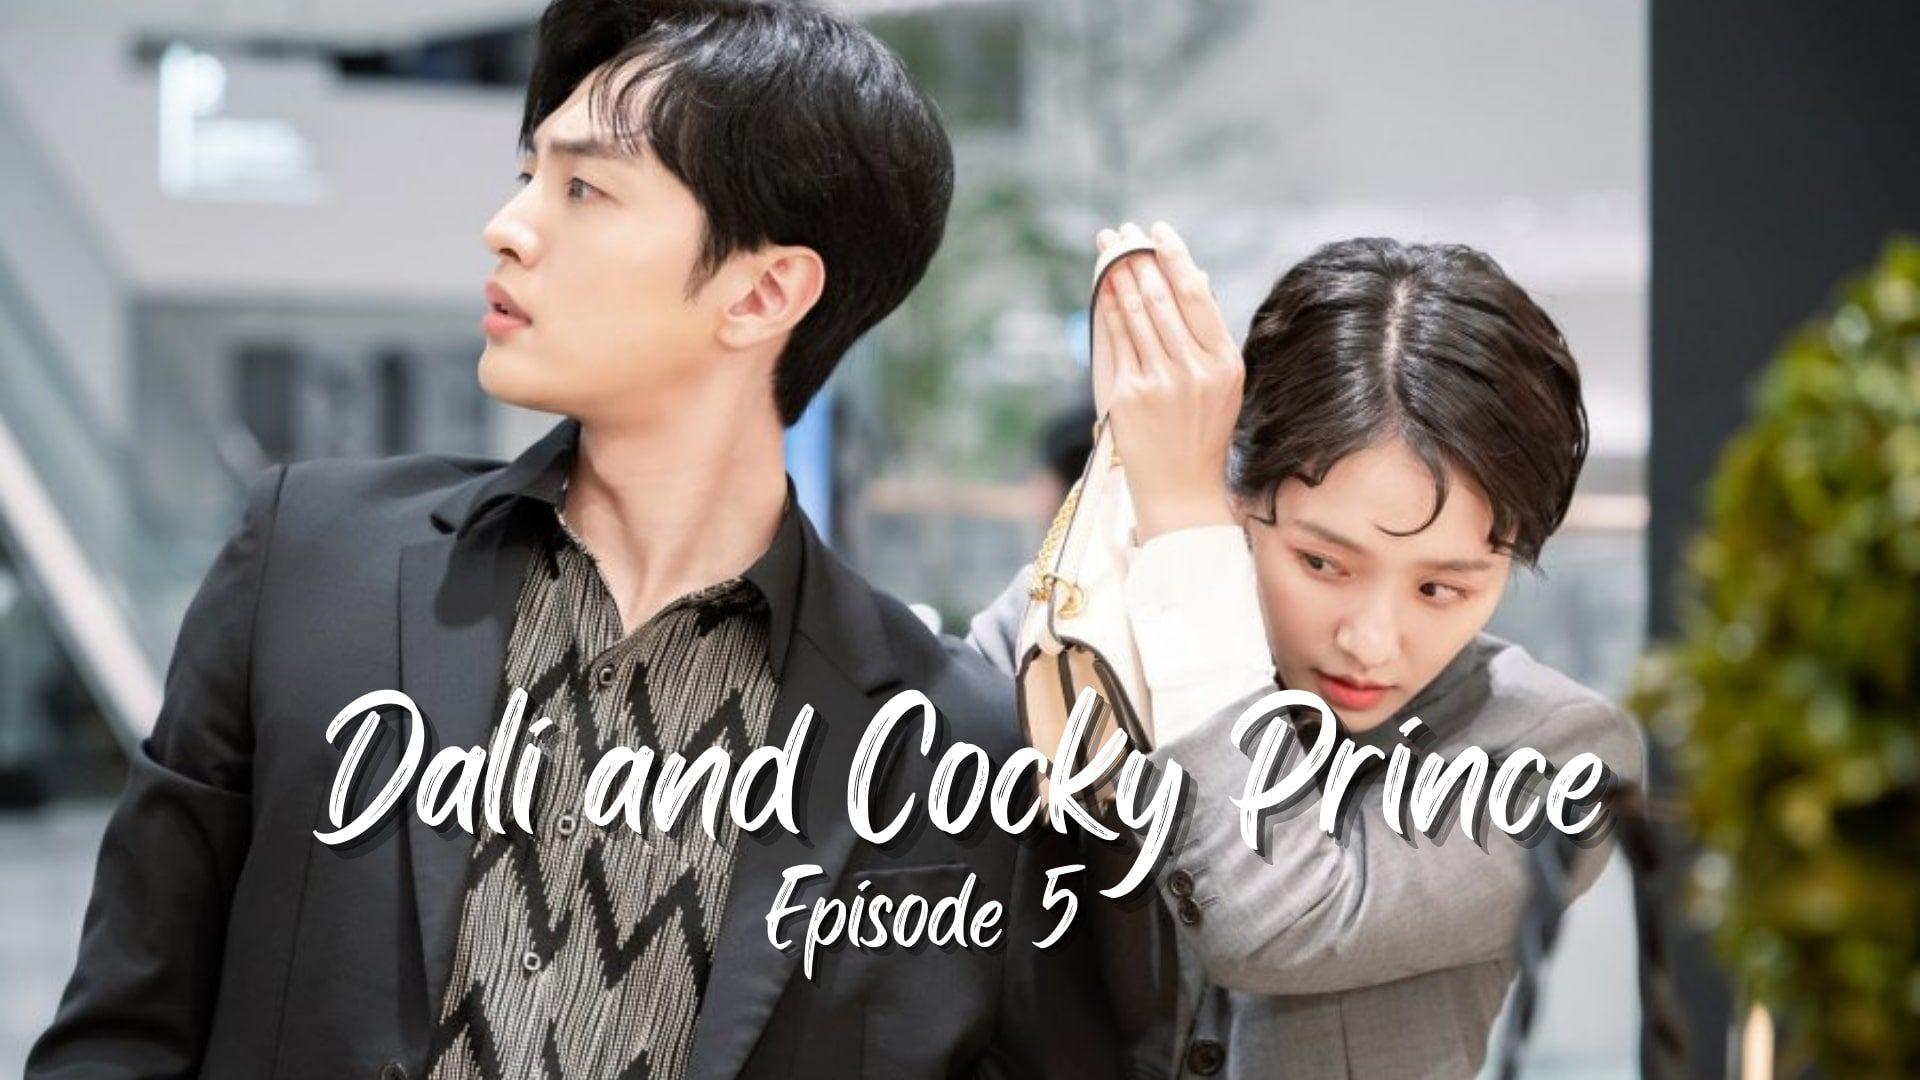 Dali And Cocky Prince Episode 5